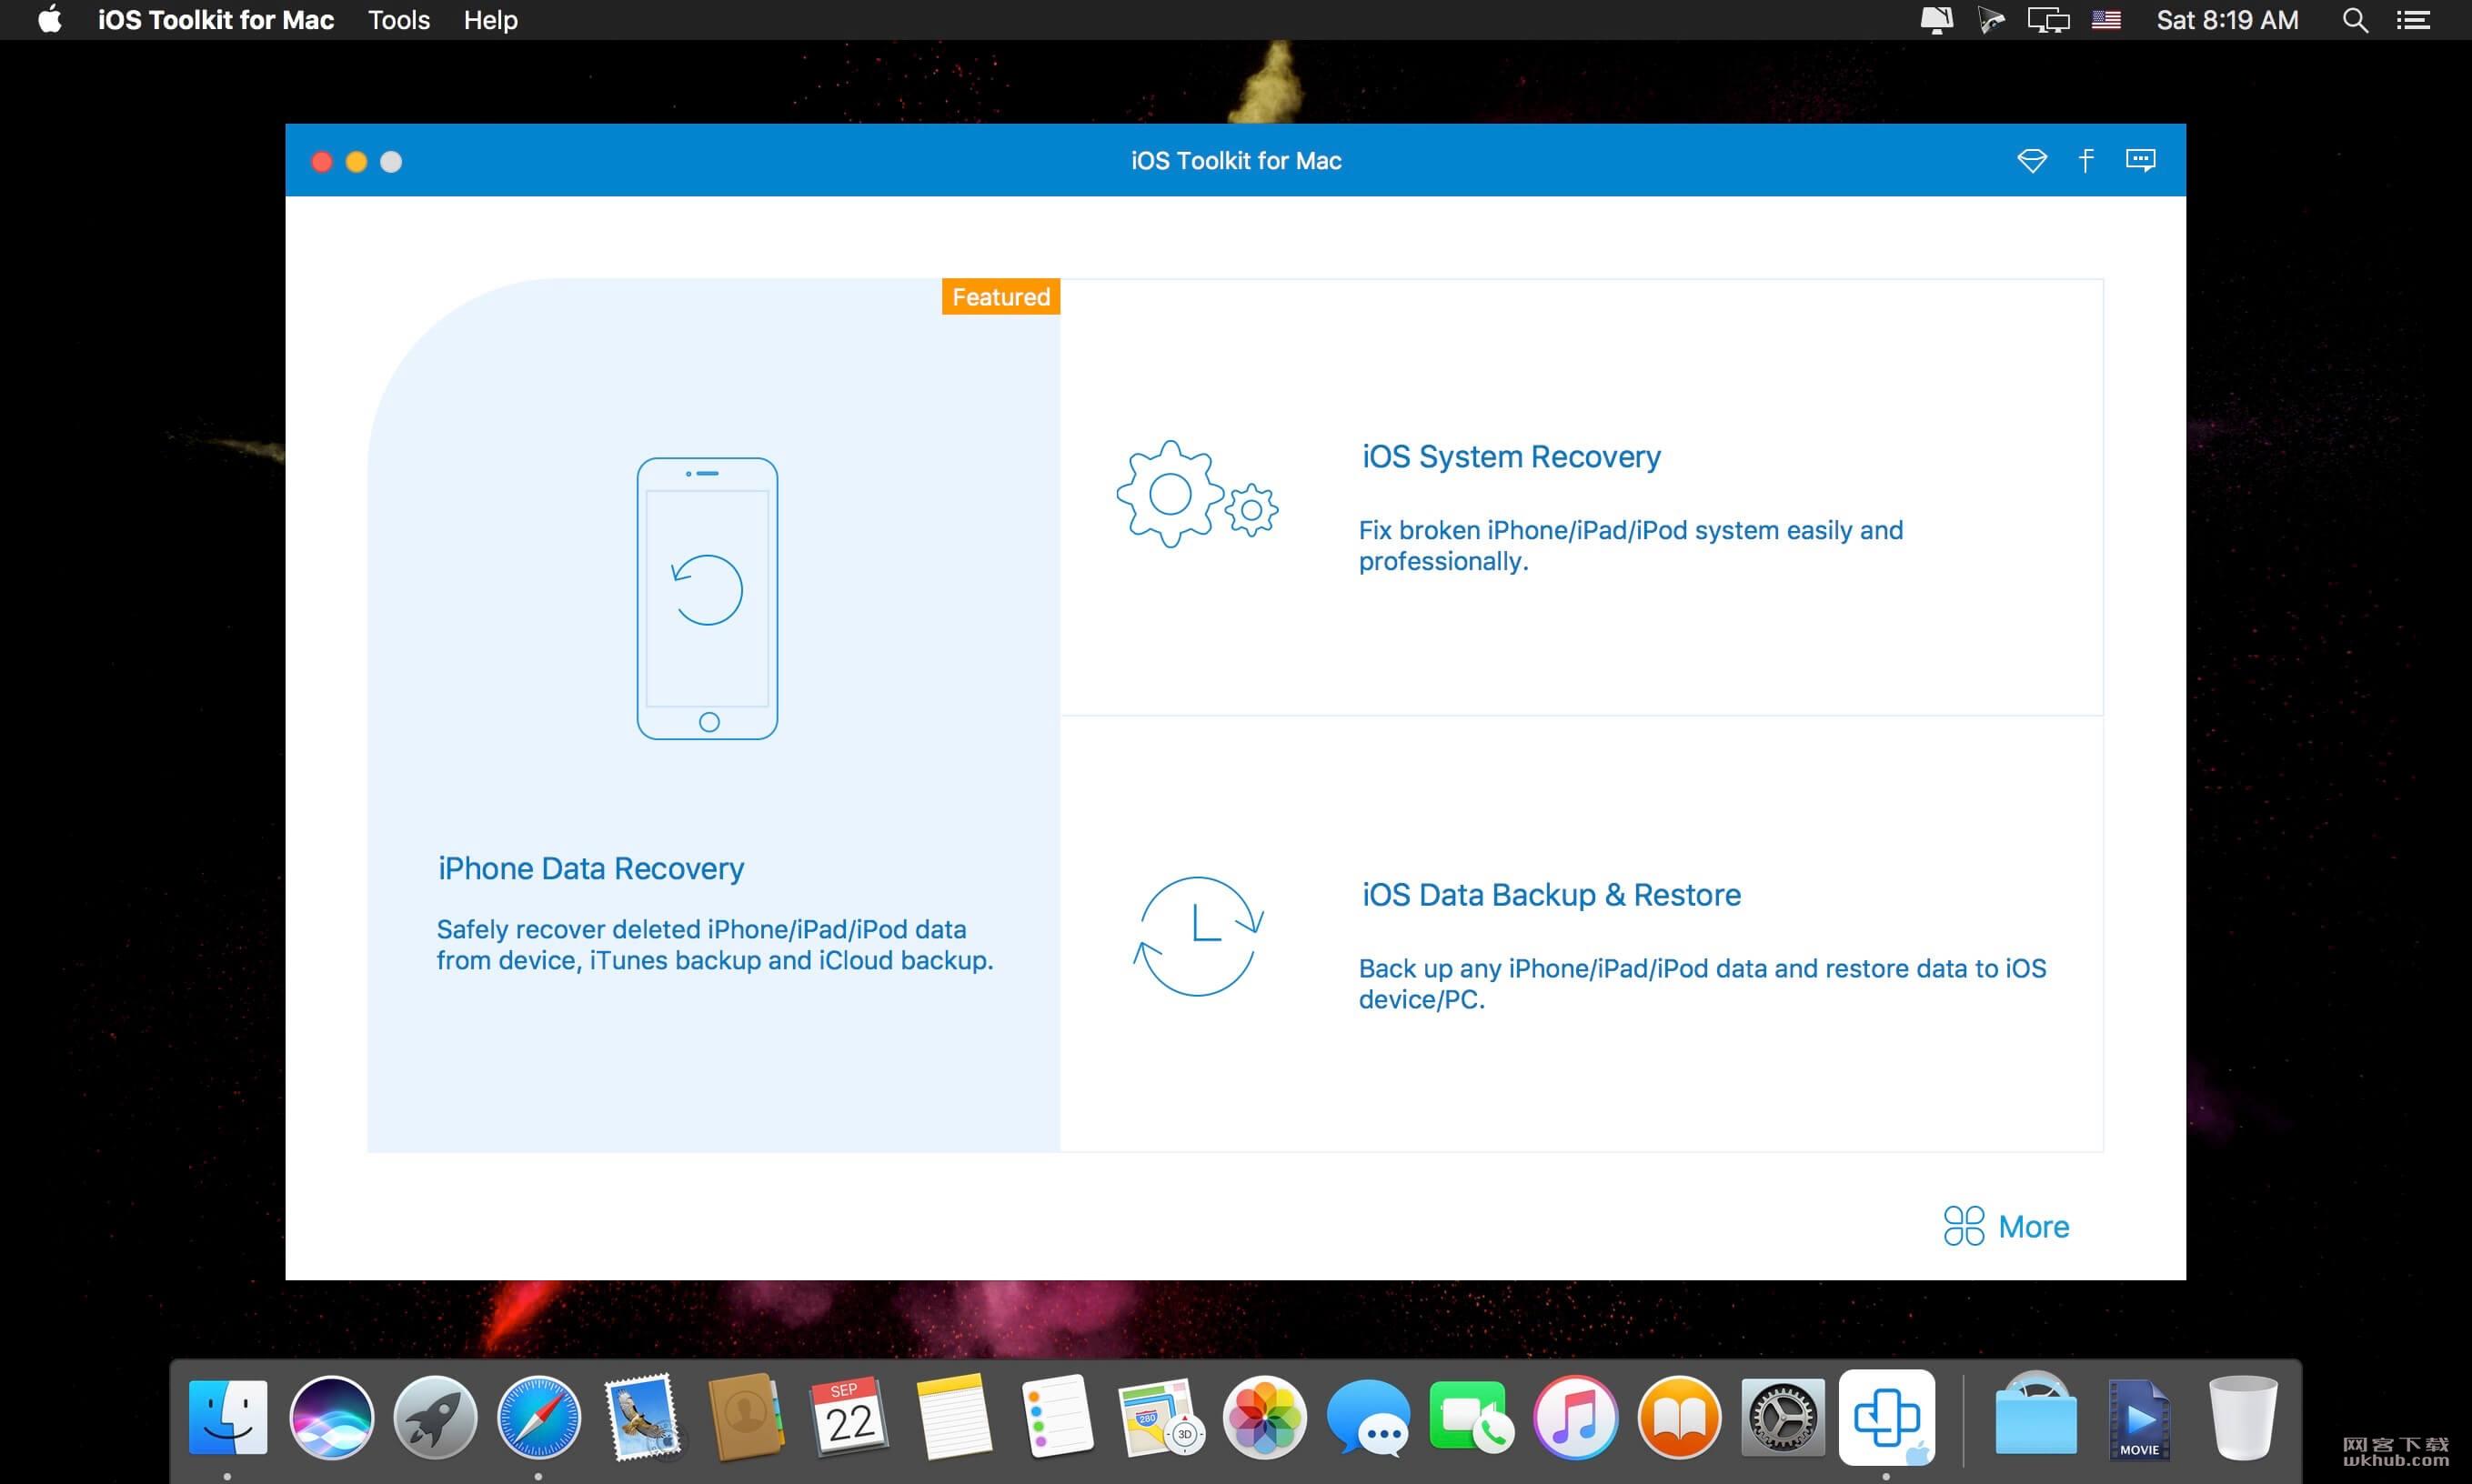 AnyMP4 iOS Toolkit 9.0.16.90764 强大的iOS设备数据恢复工具